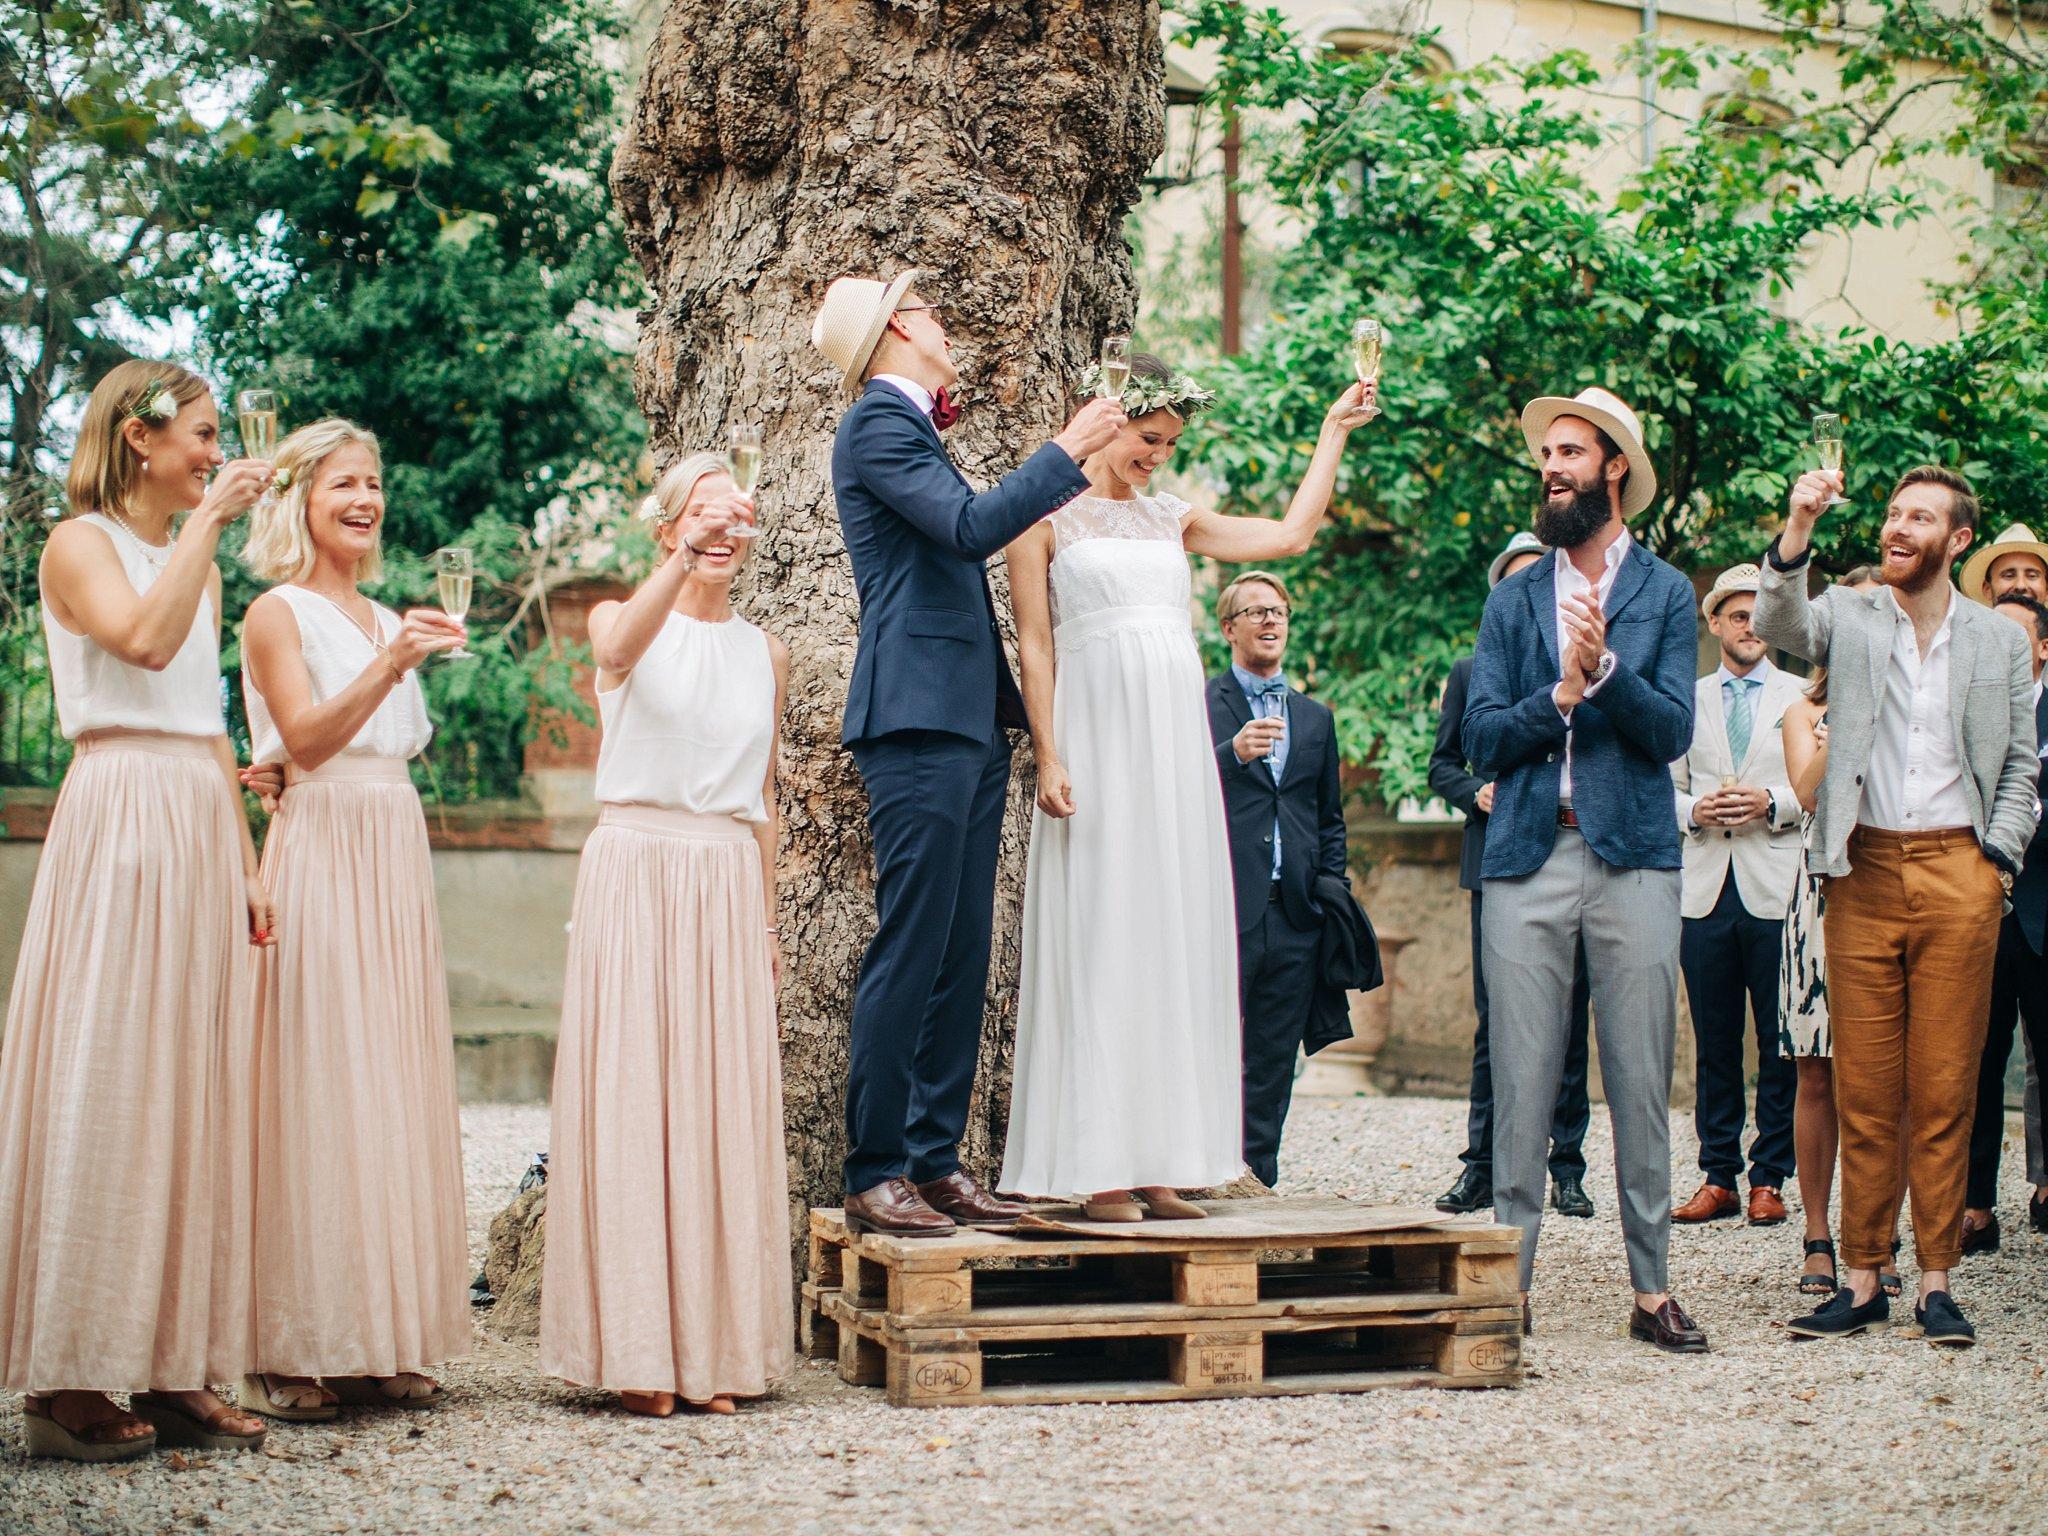 Wedding Photographer Perpignan - Château Las Collas Wedding - Hugo Hennequin039.jpg